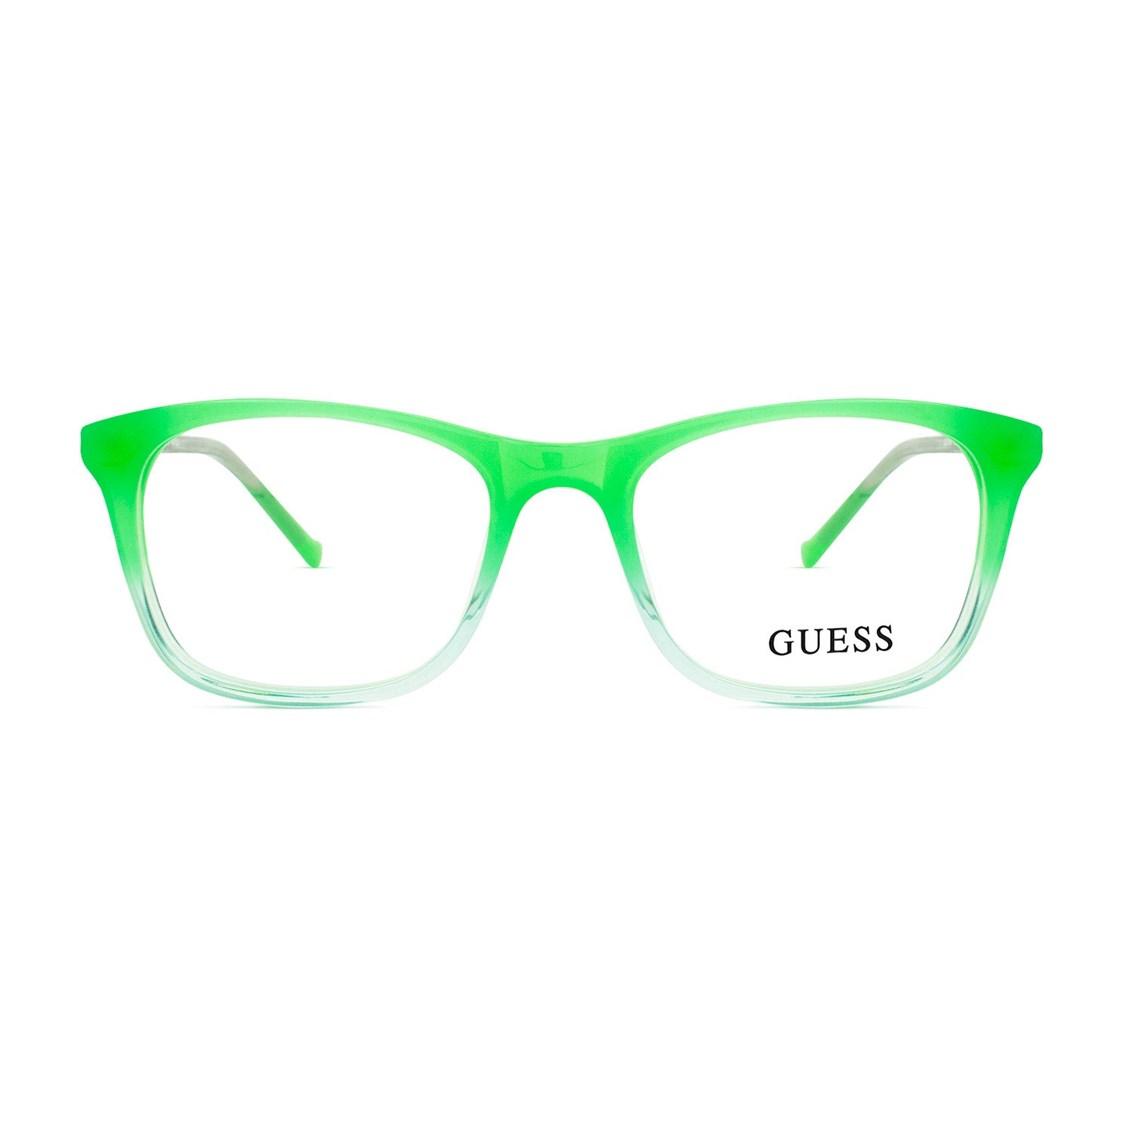 Óculos de Grau Guess Infantil GU9164 093-47